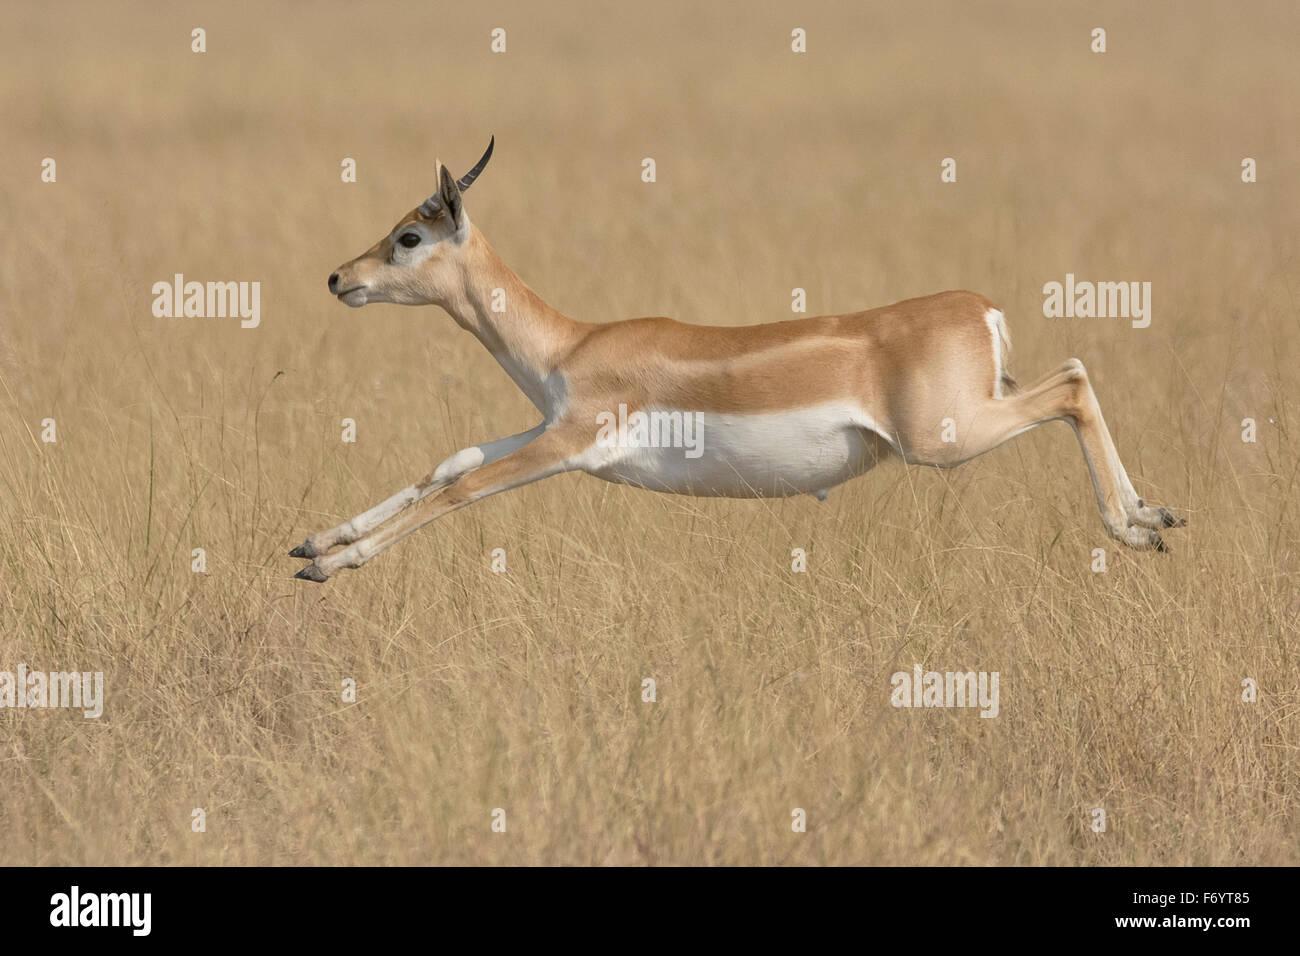 Blackbuck (Antilope cervicapra) leaping at velavadar national park, Gujarat, India - Stock Image